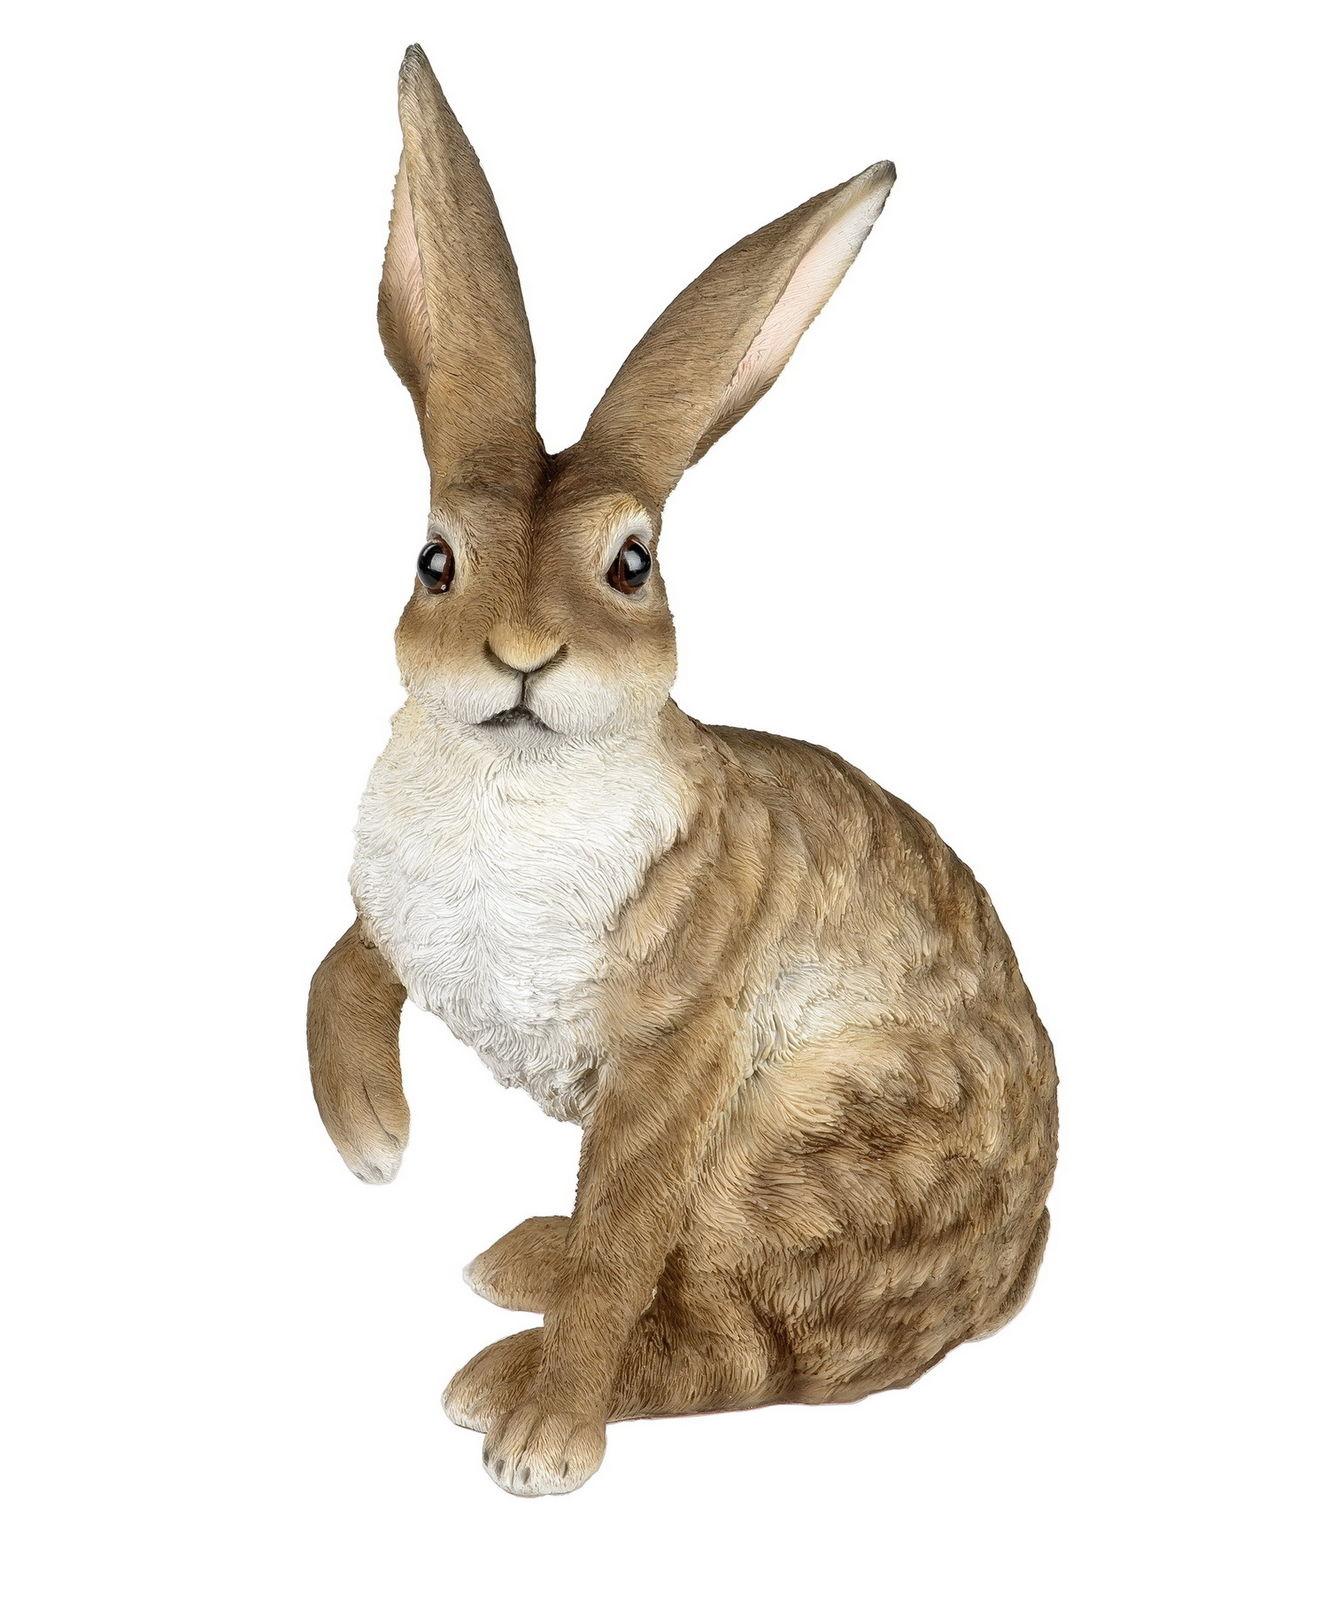 Hase Hase Hase Dekohase Kaninchen Oster Hasen Deko Garten Tier Figur Osterei Ei Skulptur 138c80